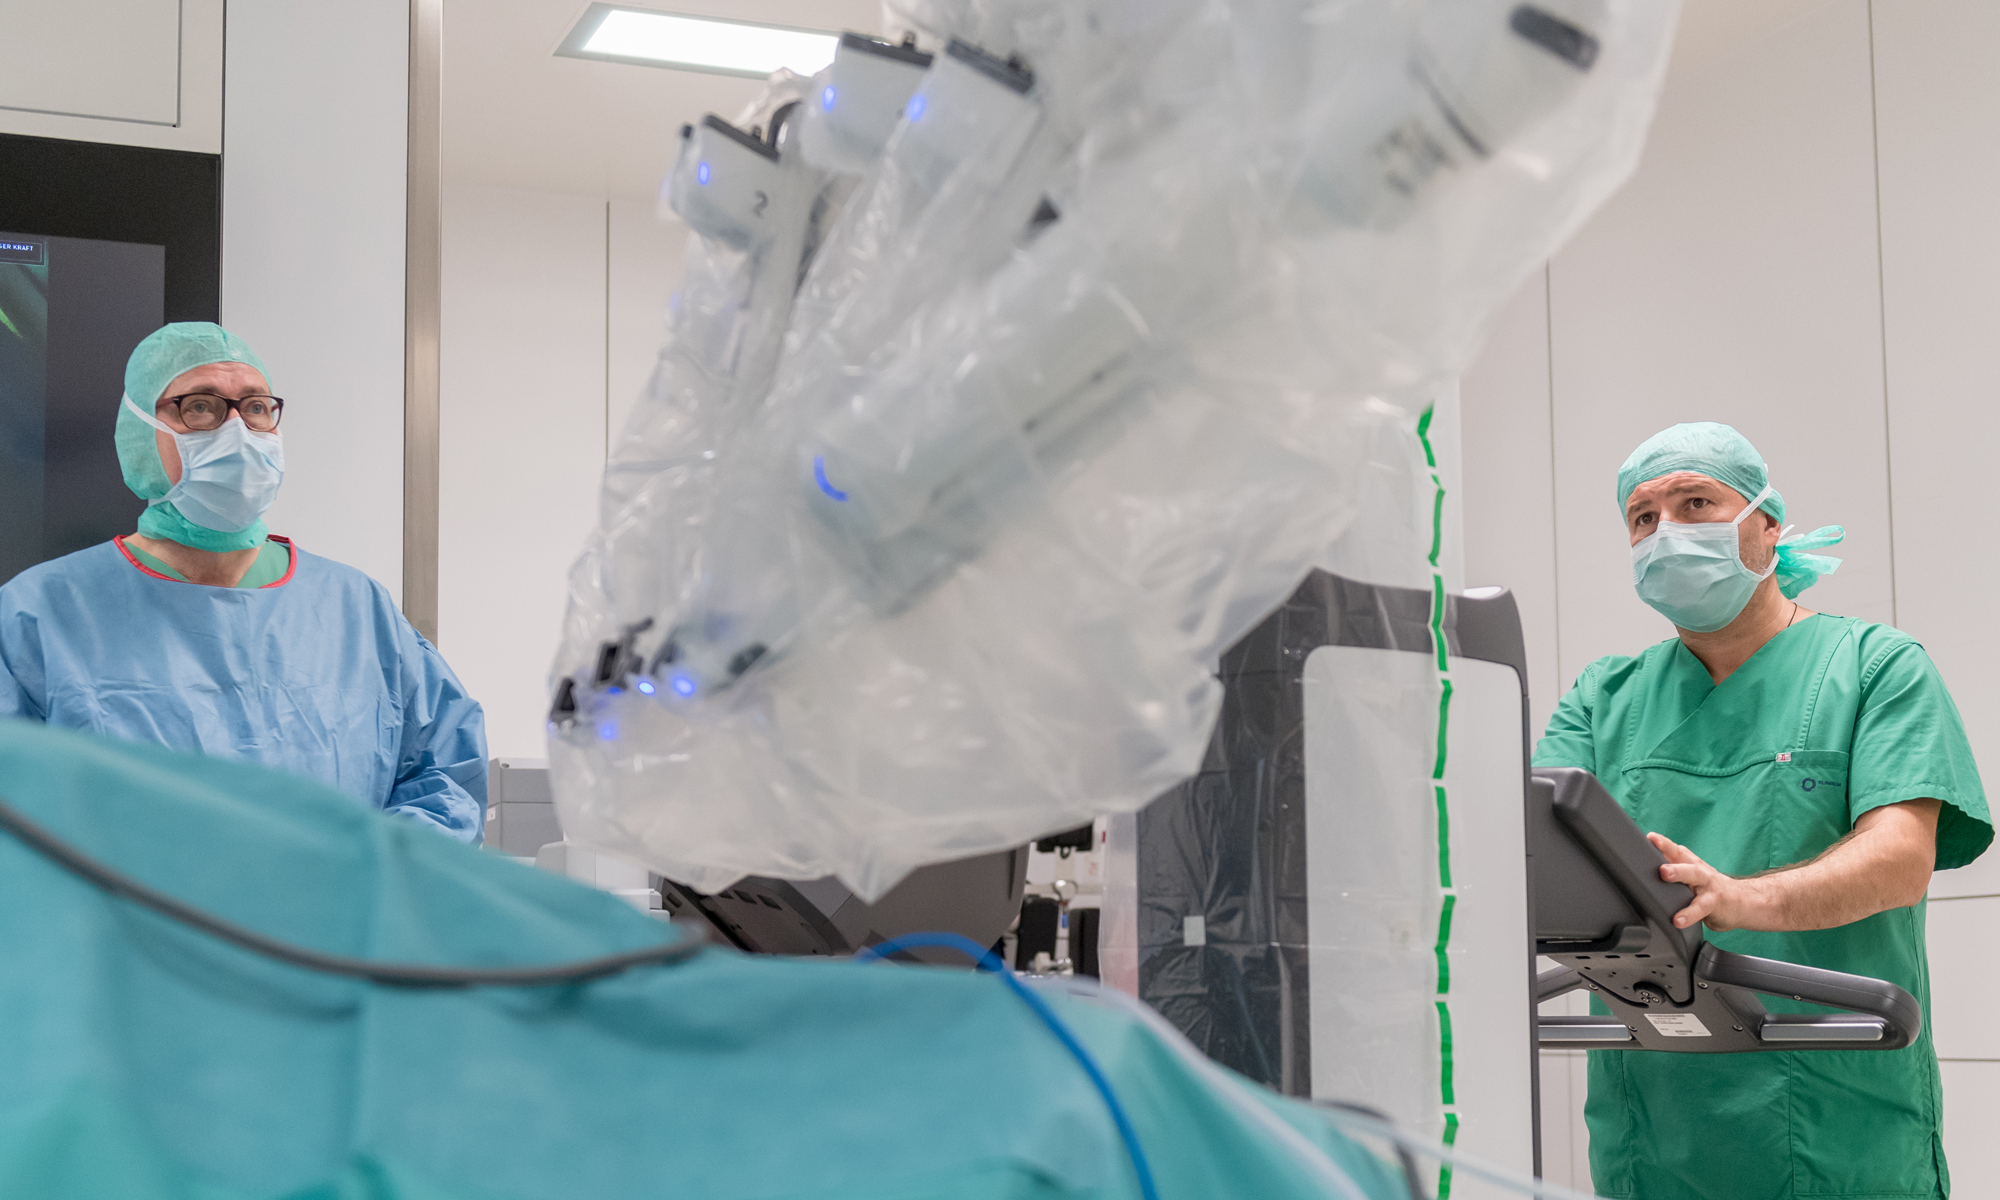 Medizin und Hightech: Florin Mechiu bringt gemeinsam mit Prof. Dr. Andreas Manseck, dem Chefarzt der Klinik für Urologie, den OP-Roboter da Vinci in Position.